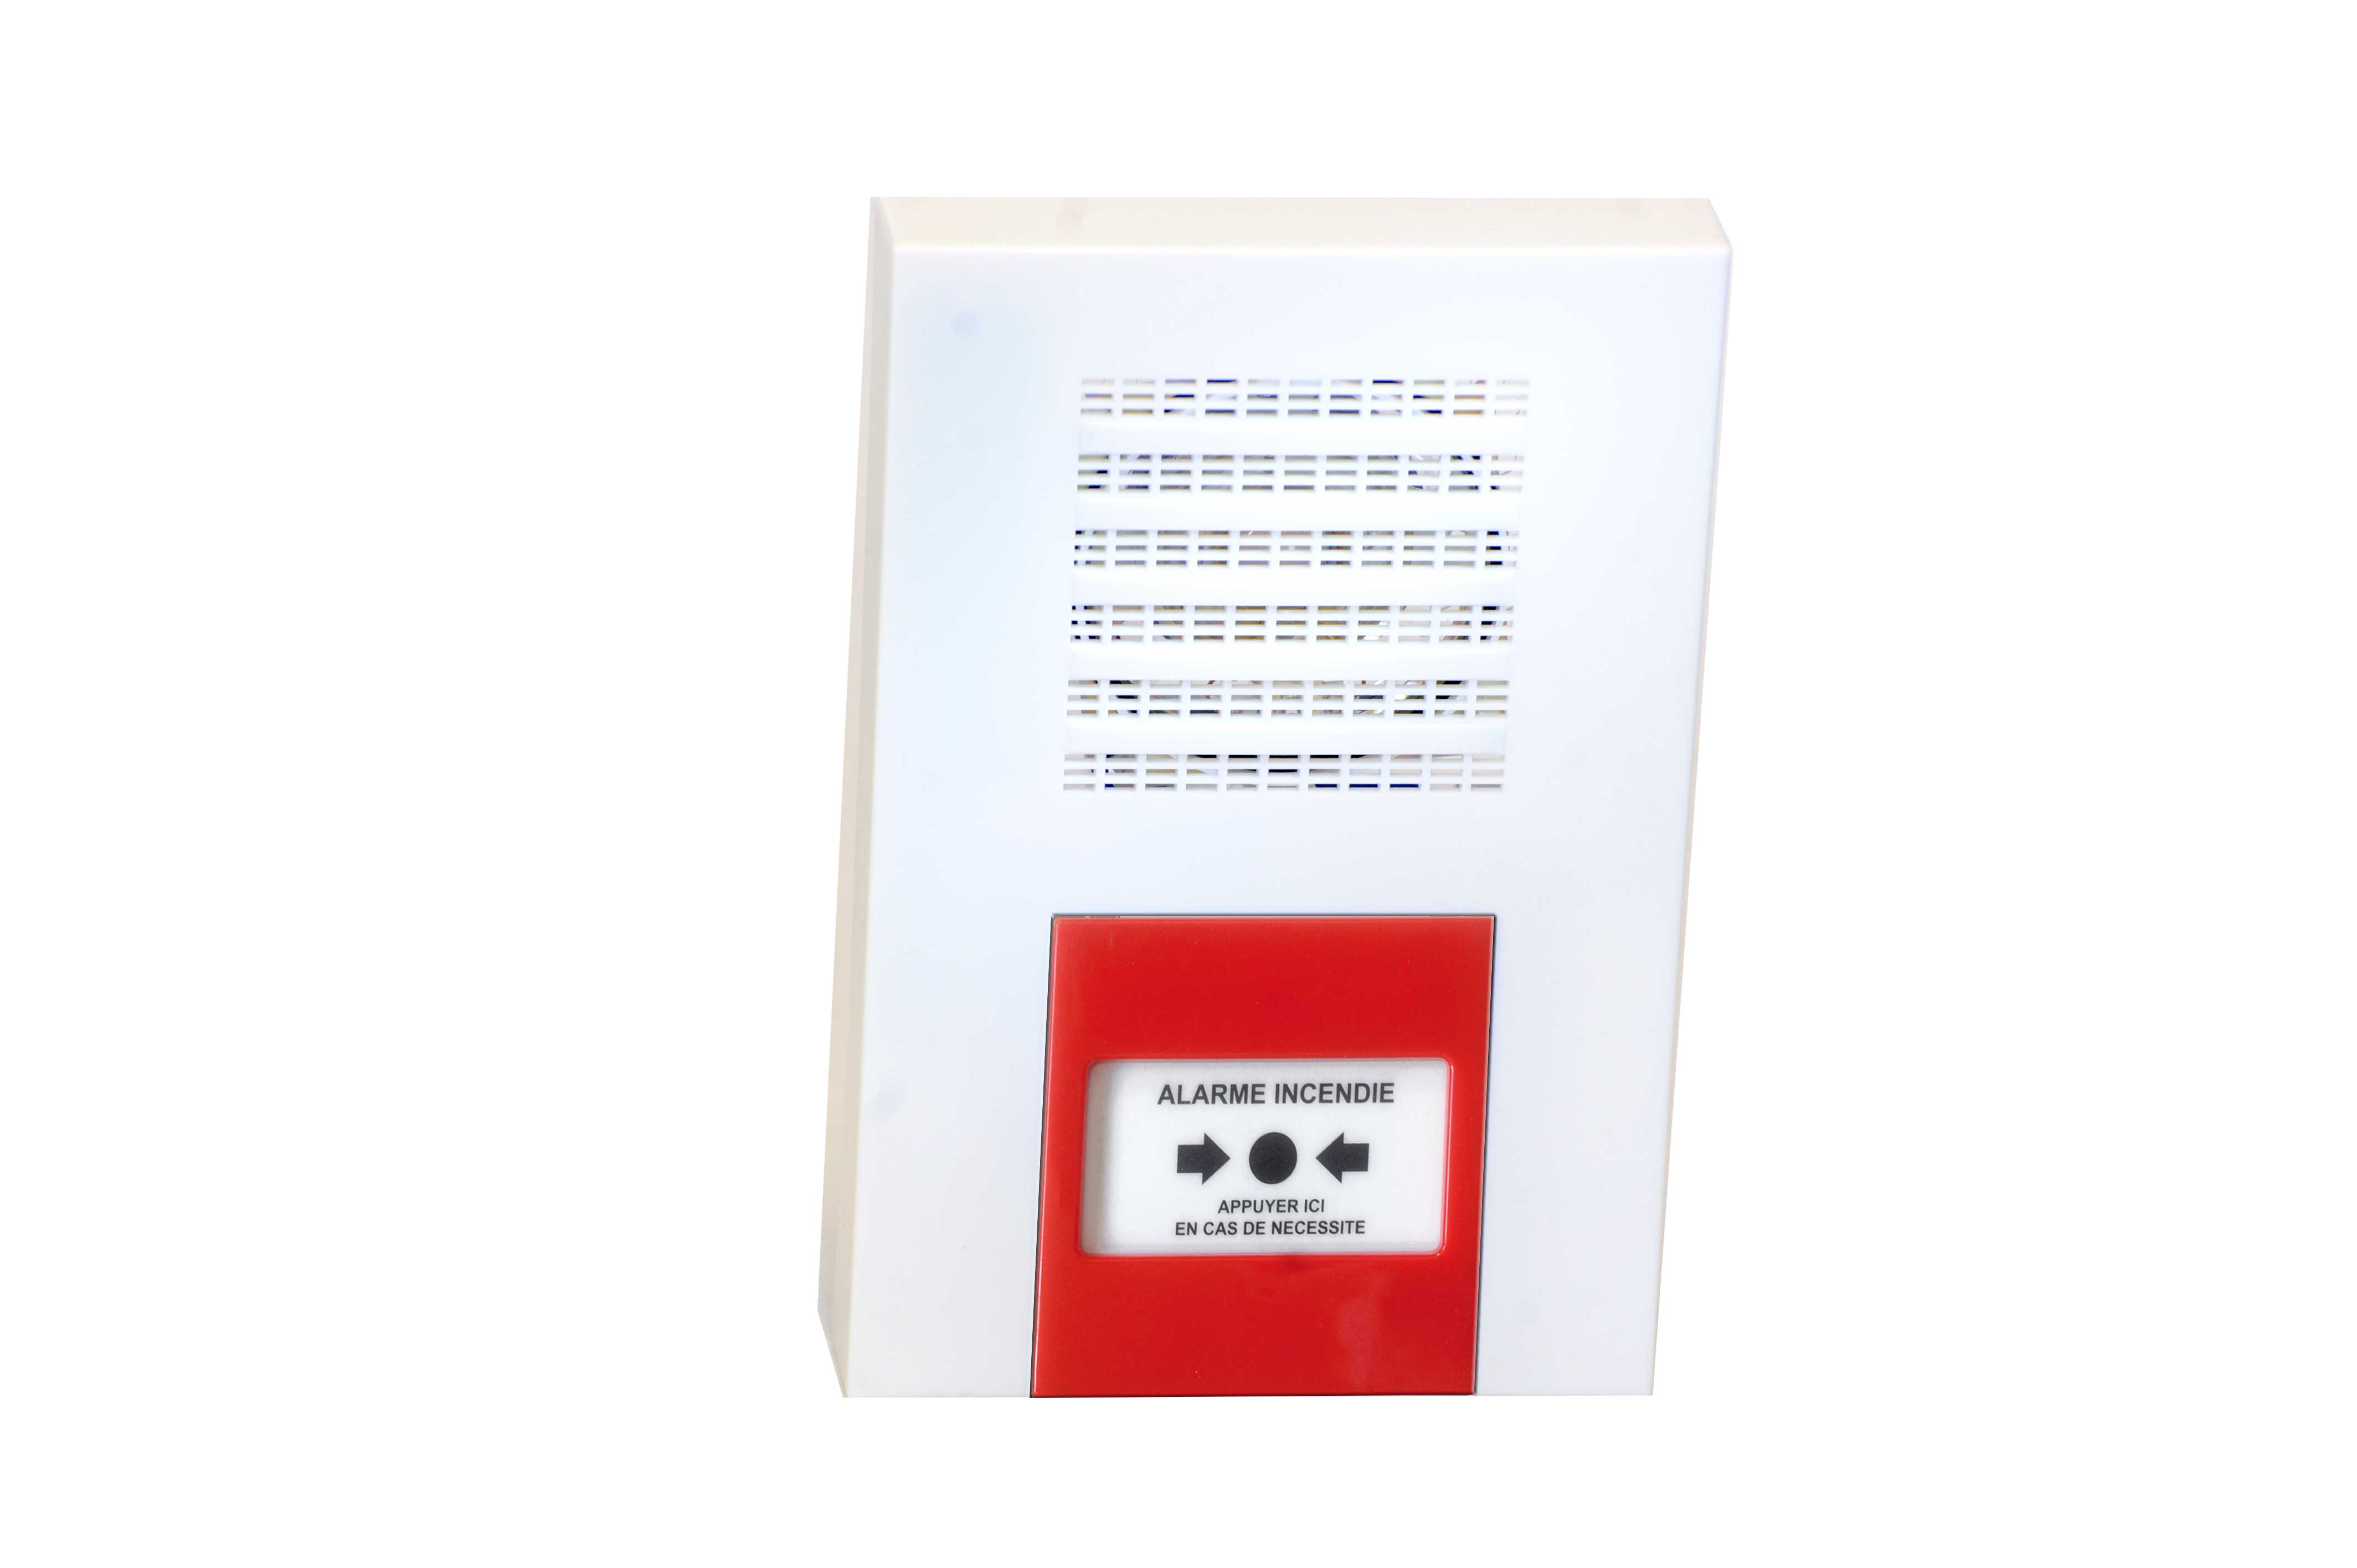 alarme type 4 erp fabulous alarme type agylus cordia. Black Bedroom Furniture Sets. Home Design Ideas